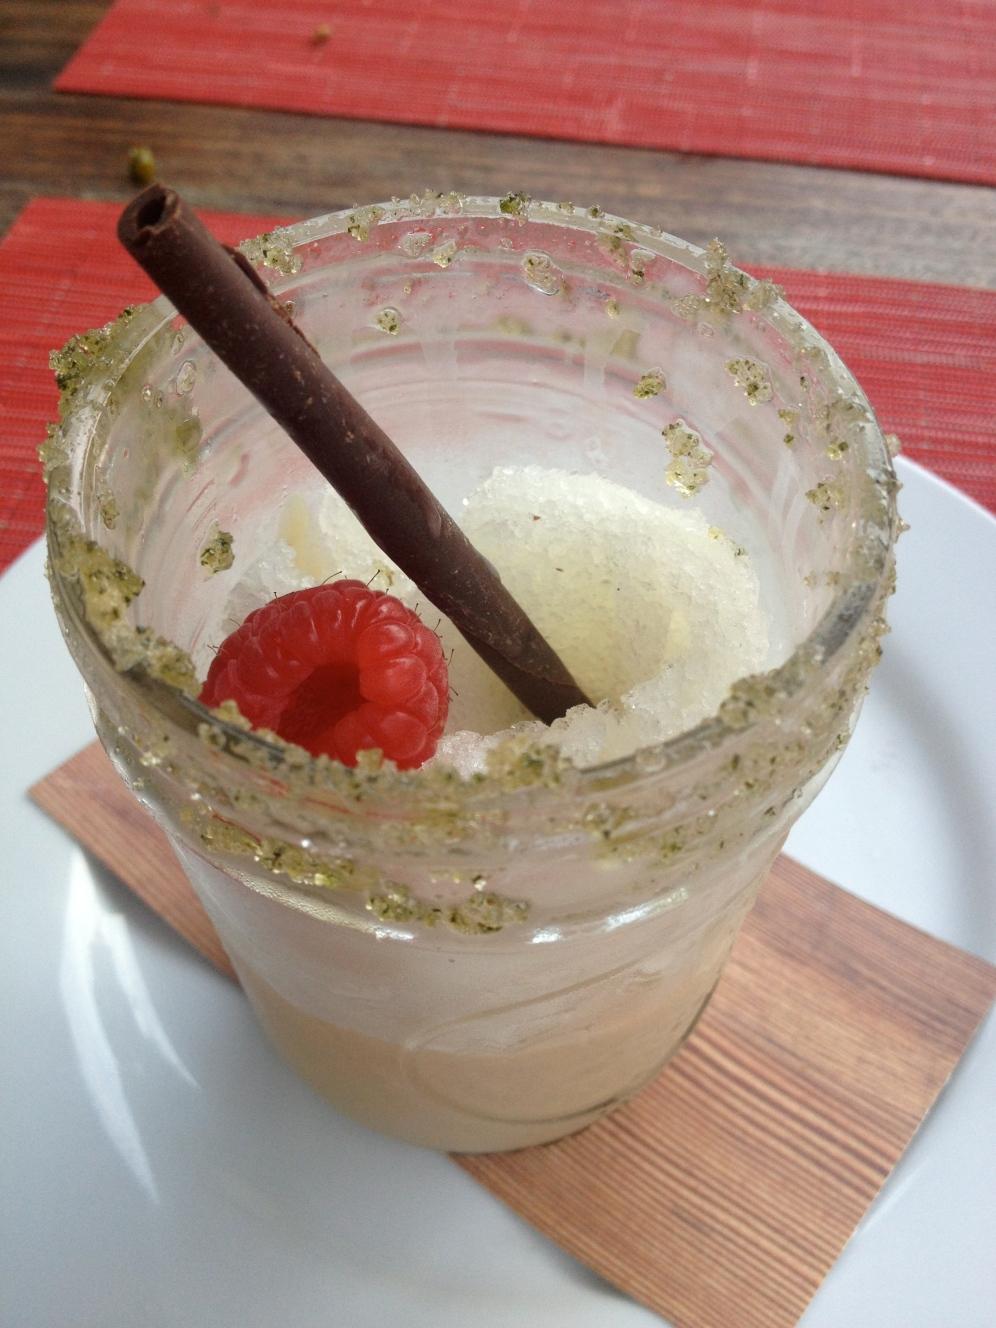 Frozen Arnold Palmer - sweet tea semifreddo and meyer lemon granita (c) Winter Shanck, 2013